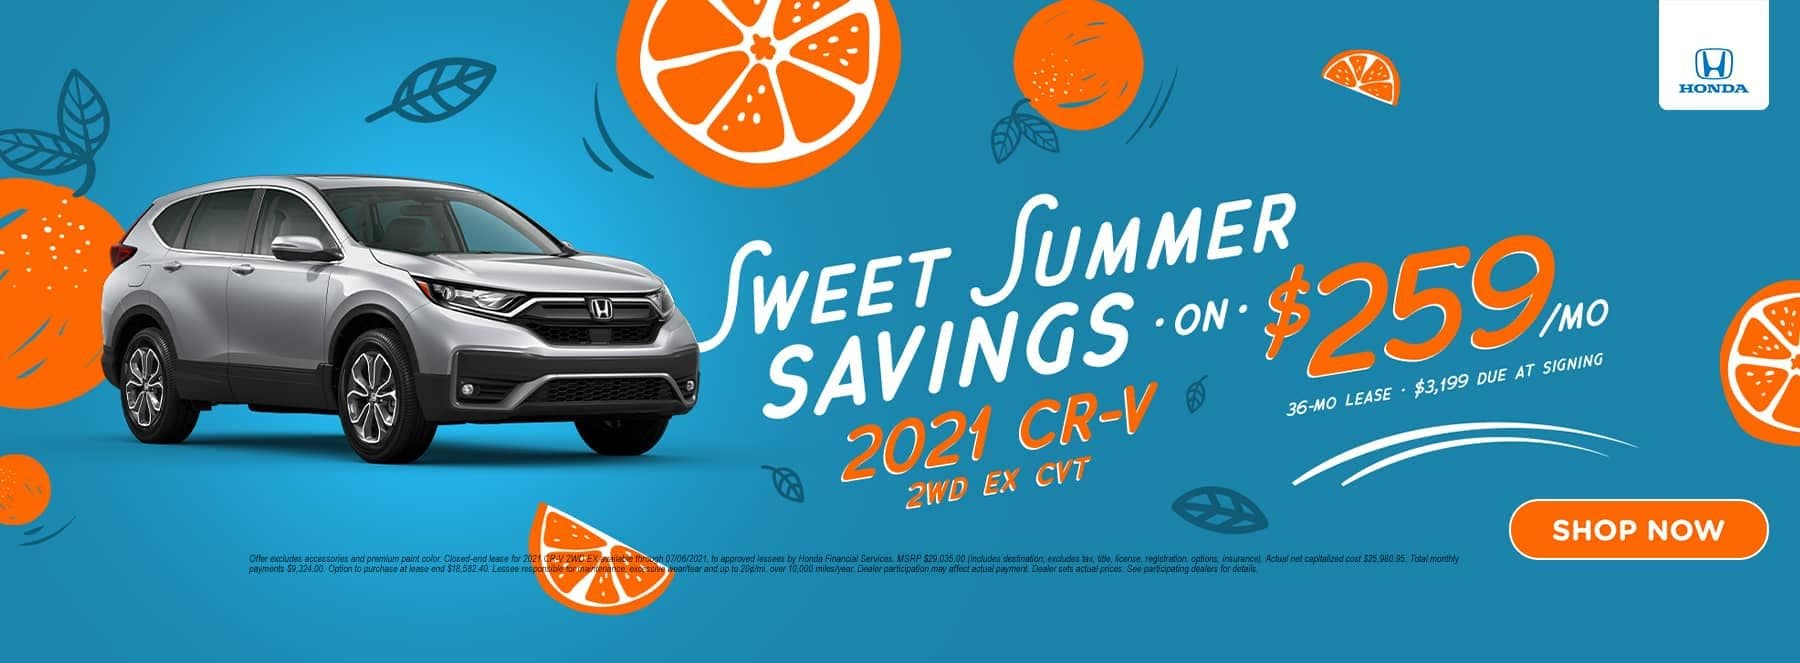 Sweet Summer Savings 2021 CR-V 2WD EX CVT